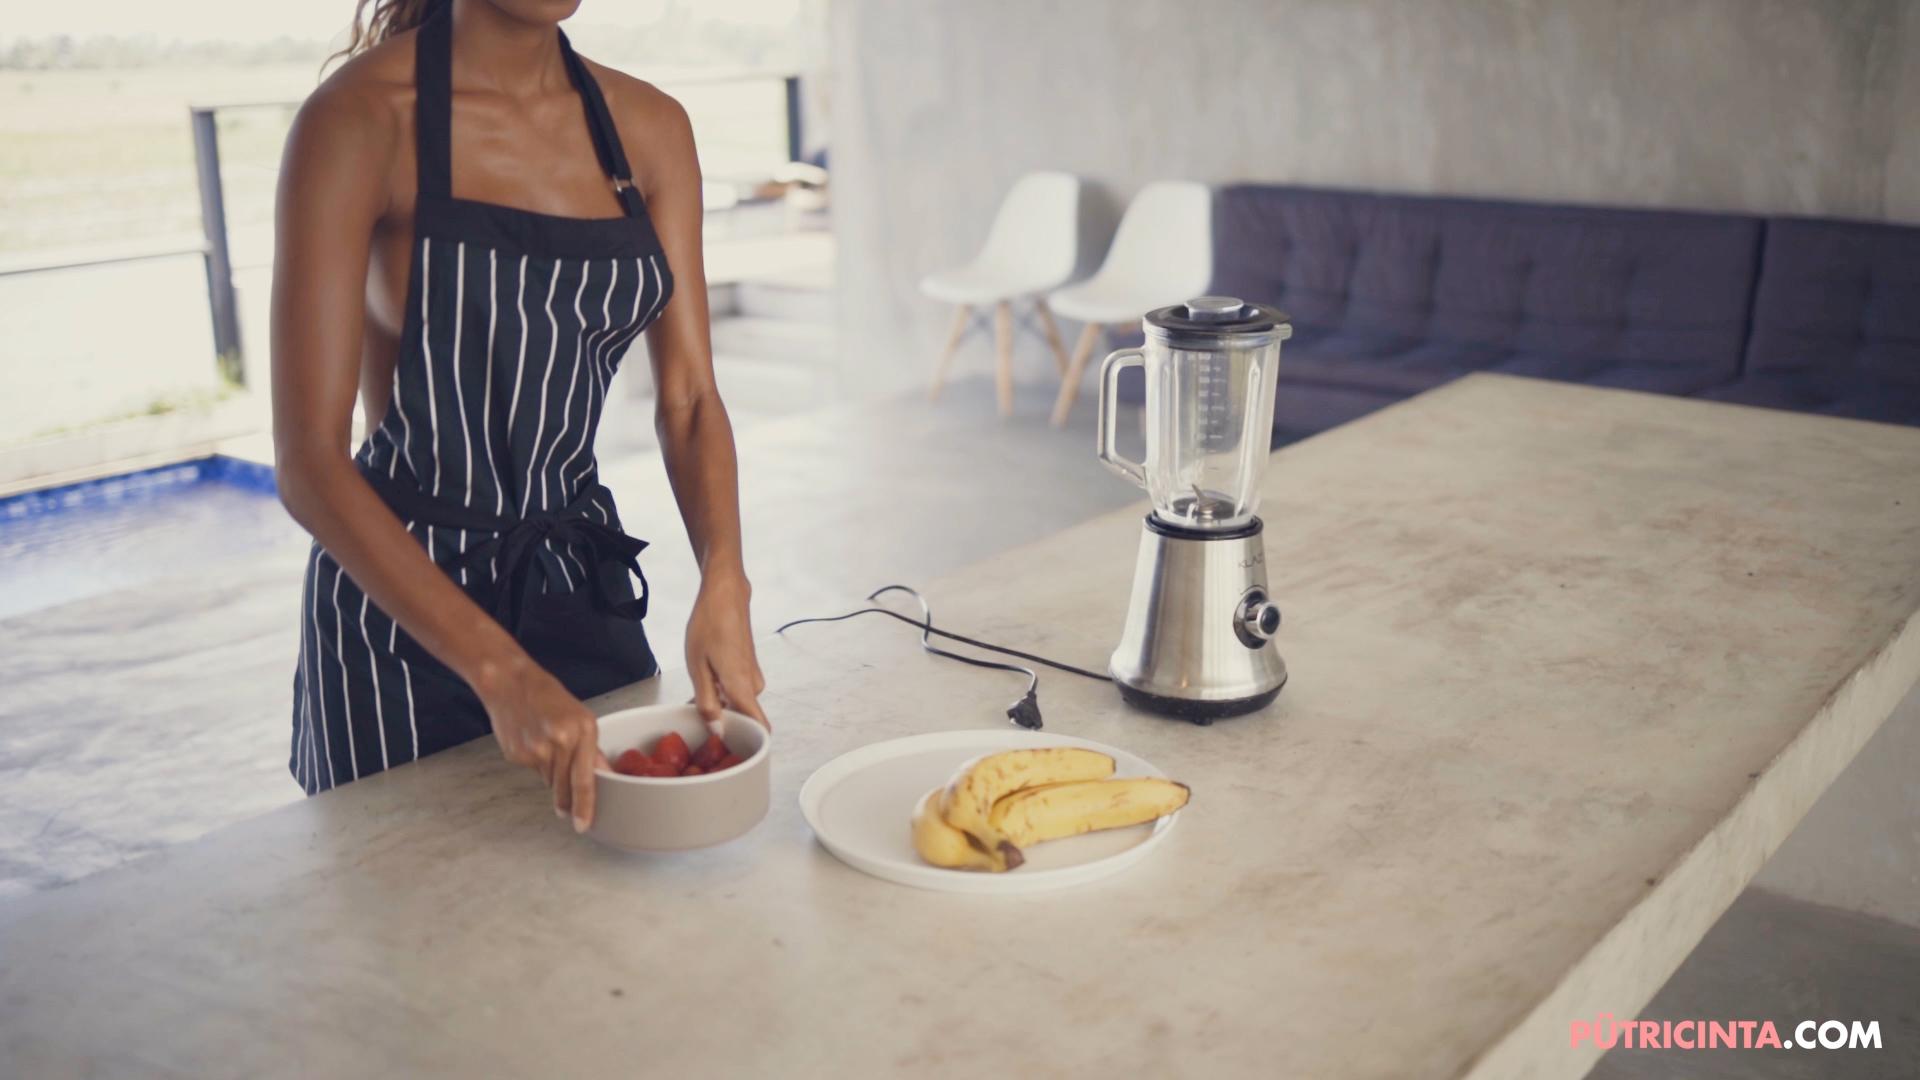 028-Putri-Cinta-Cooking-Class-mainvid-stills-3.jpg